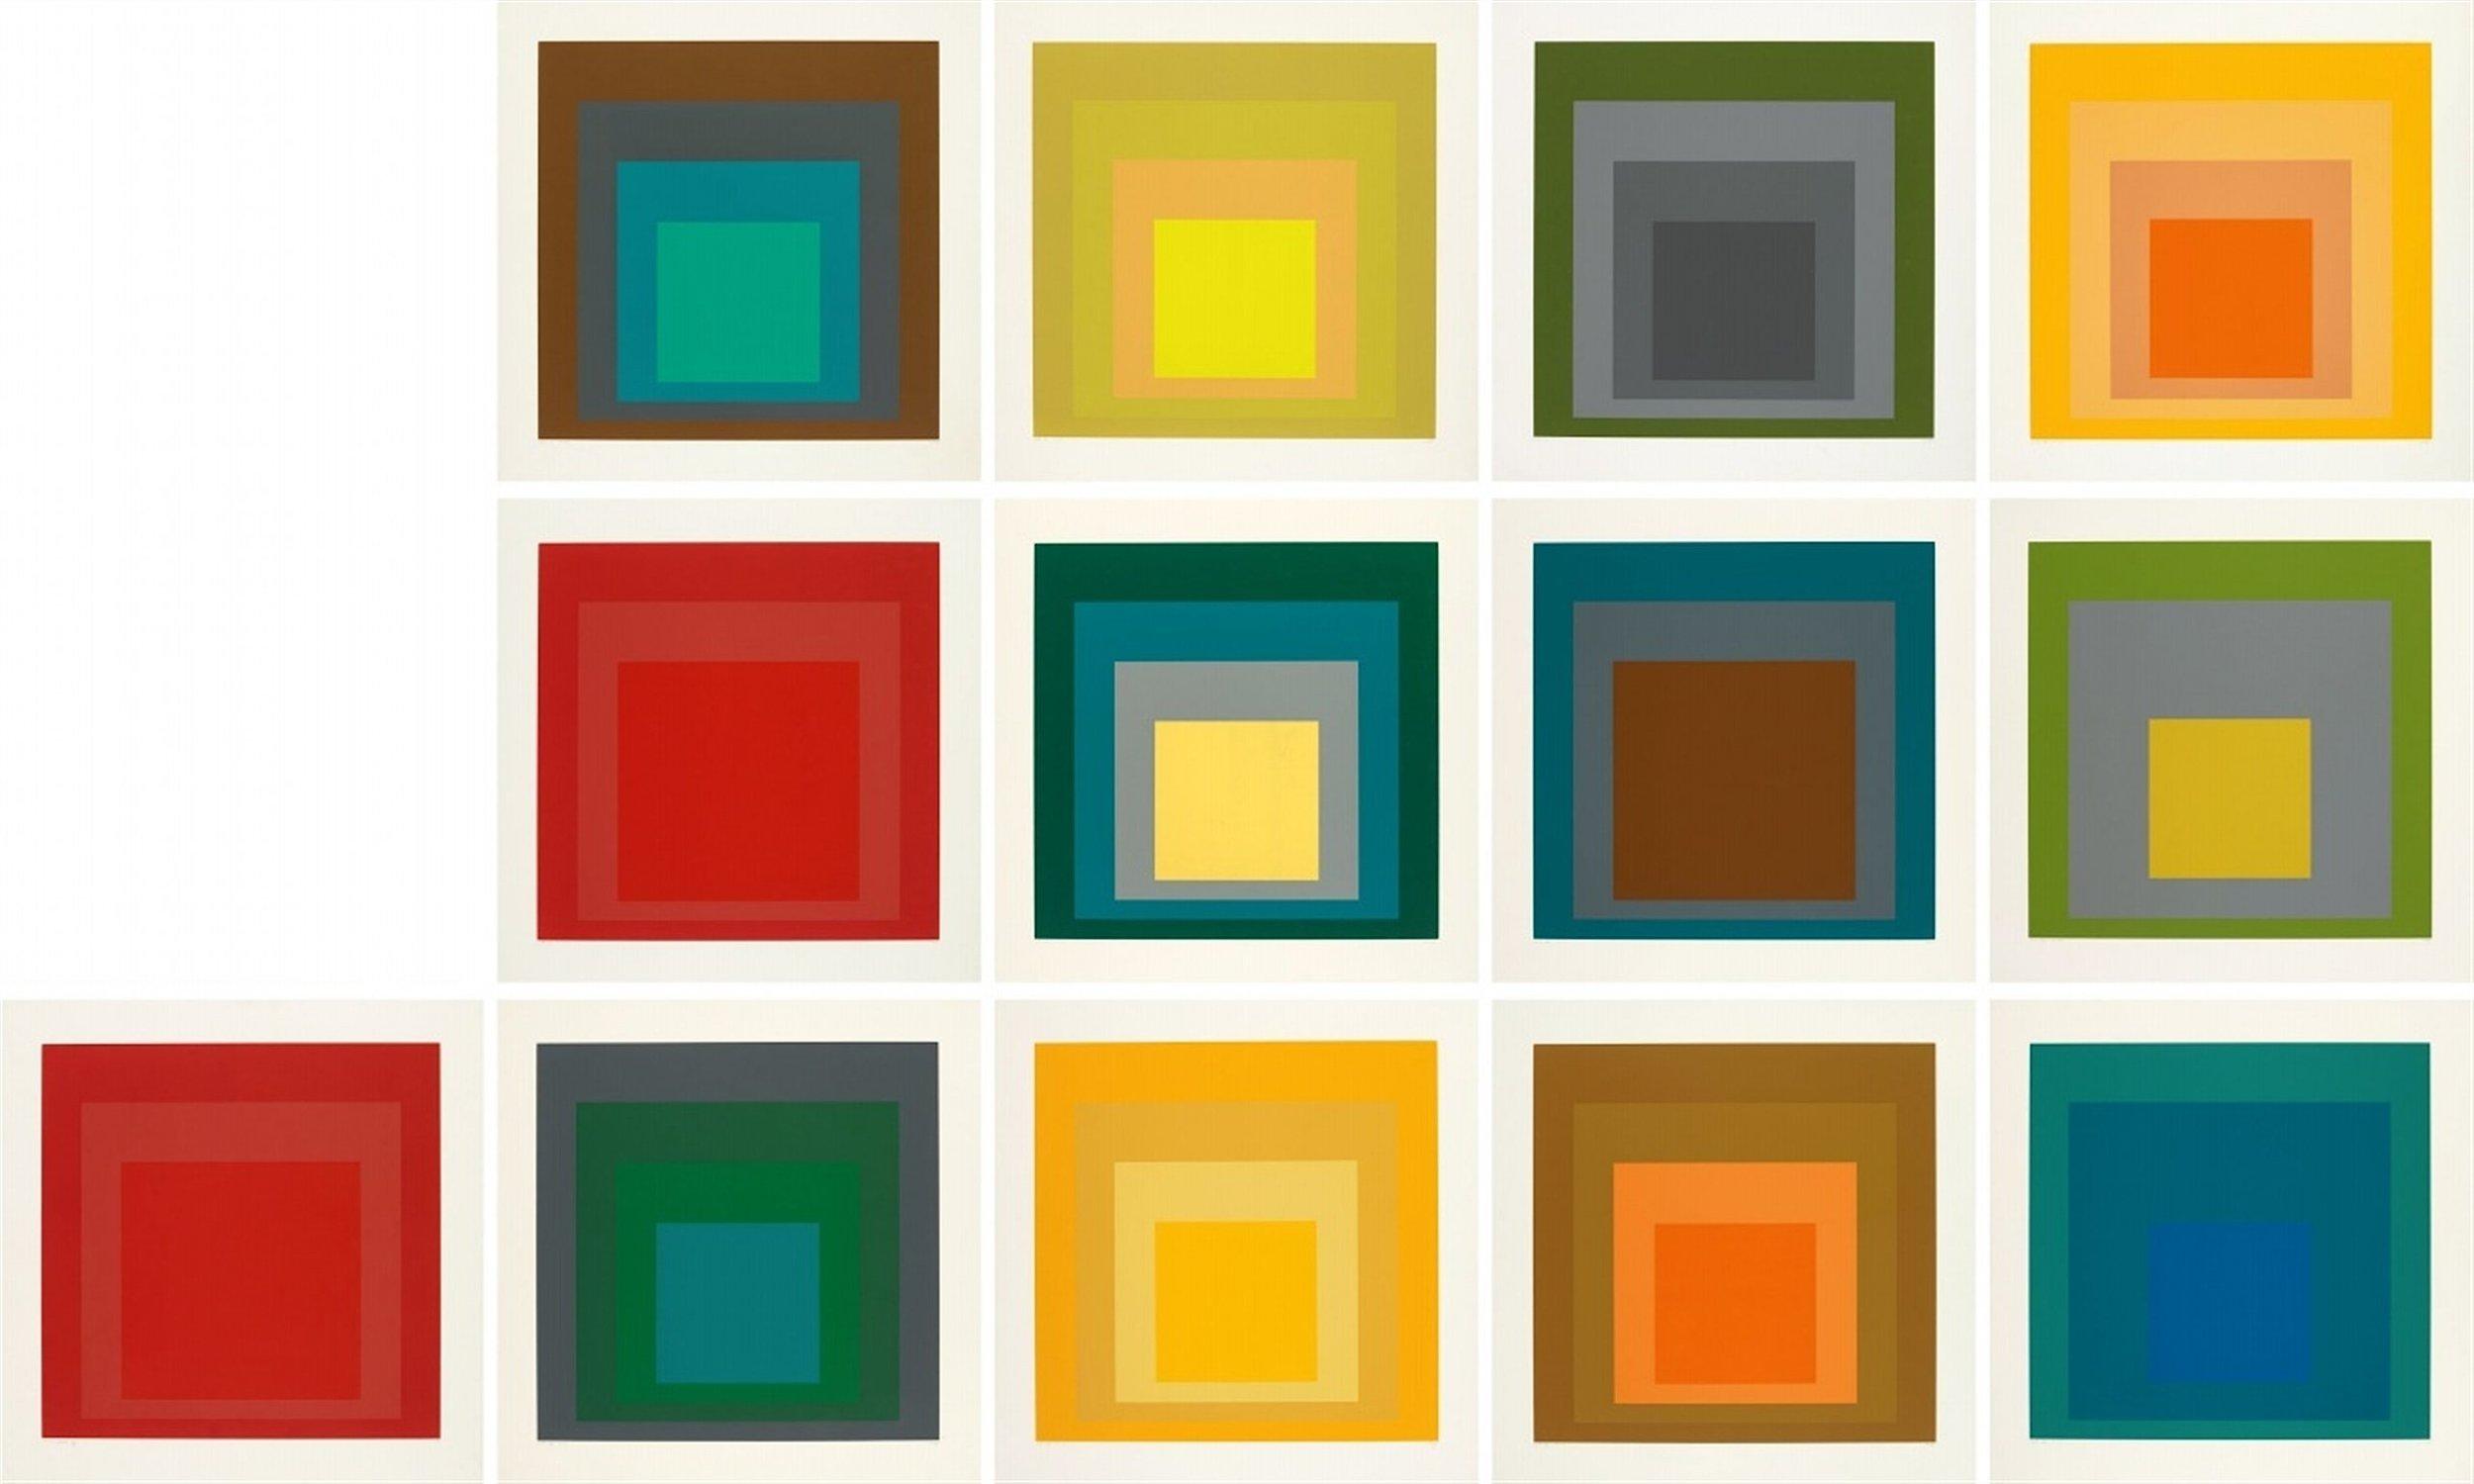 csm_Lempertz-1122-508-Contemporary-Art-Josef-Albers-SP-Homage-to-the-Square-_1419fef36d.jpg